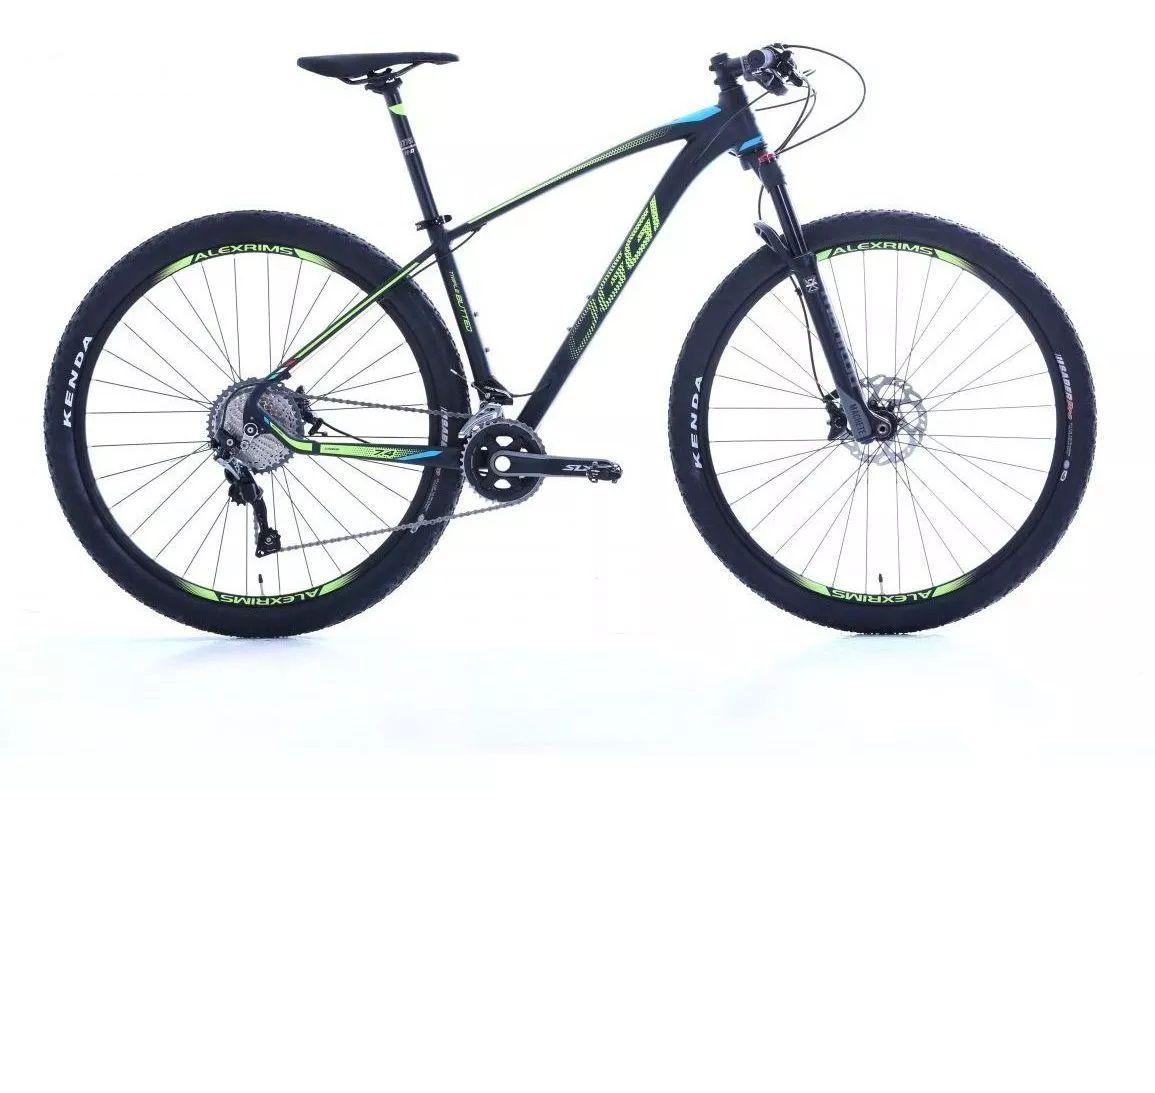 Bicicleta Oggi - Big Wheel 7.4 - 2019 - Preta / Amarela / Azul